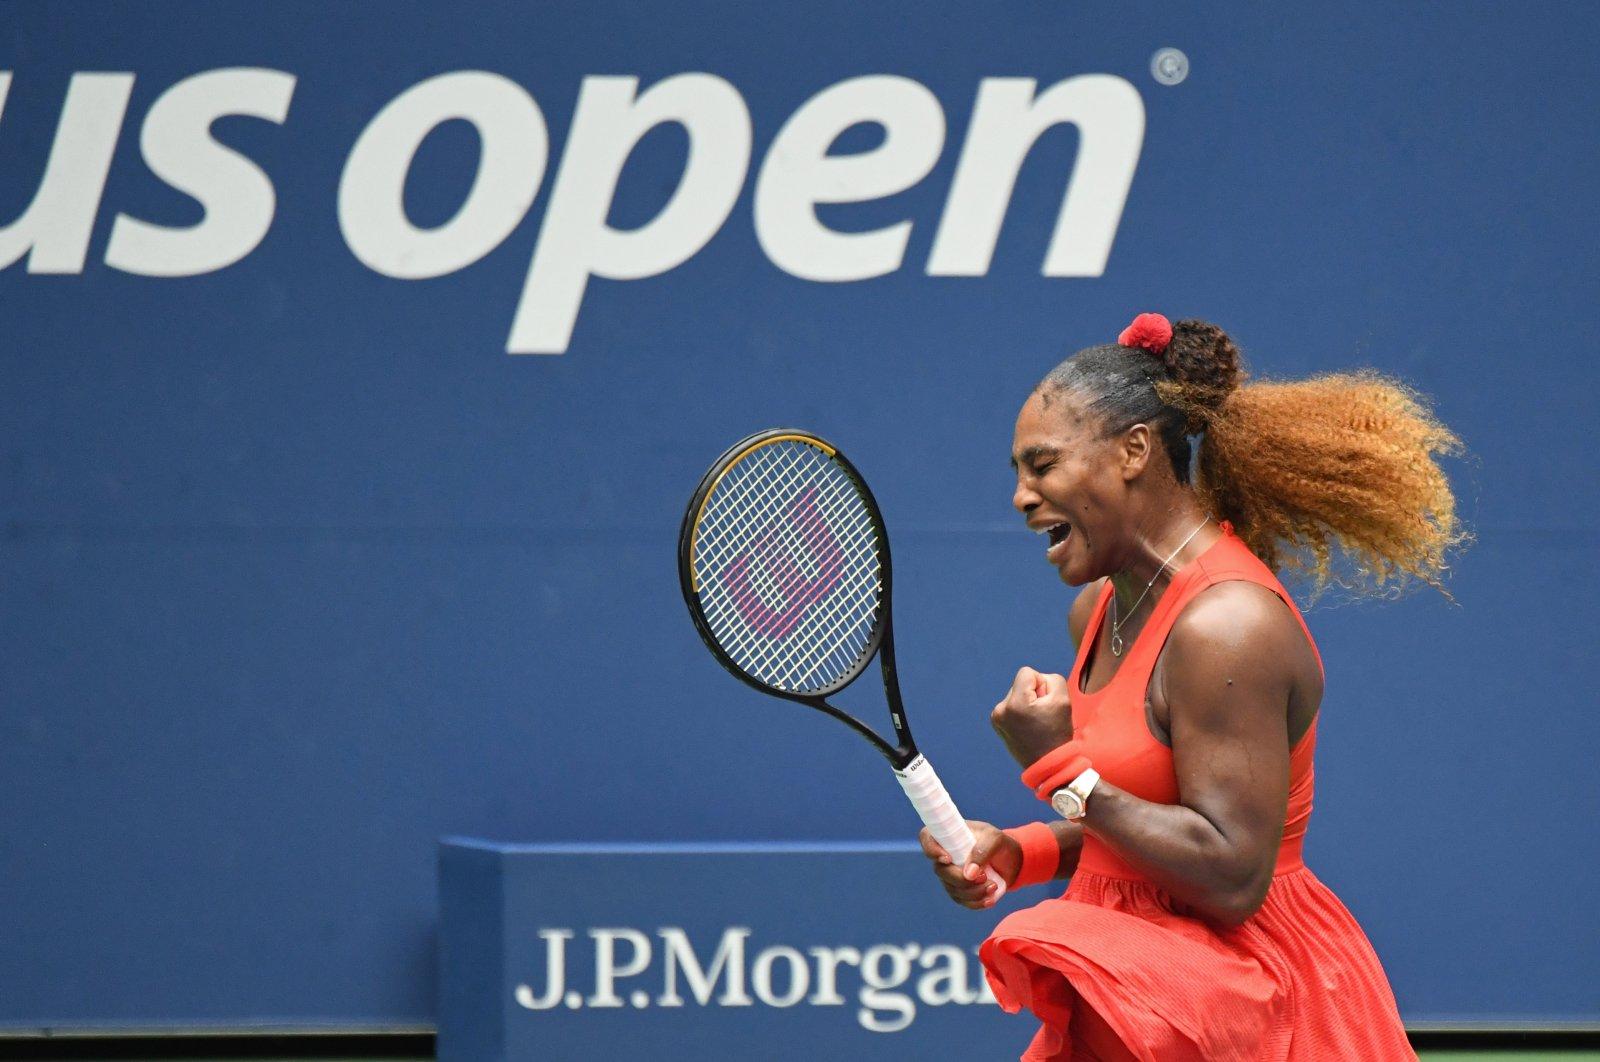 Serena Williams reacts during her quarterfinal match against Tsvetana Pironkova at the U.S. Open tournament in New York, U.S., Sept. 9, 2020. (Reuters Photo)